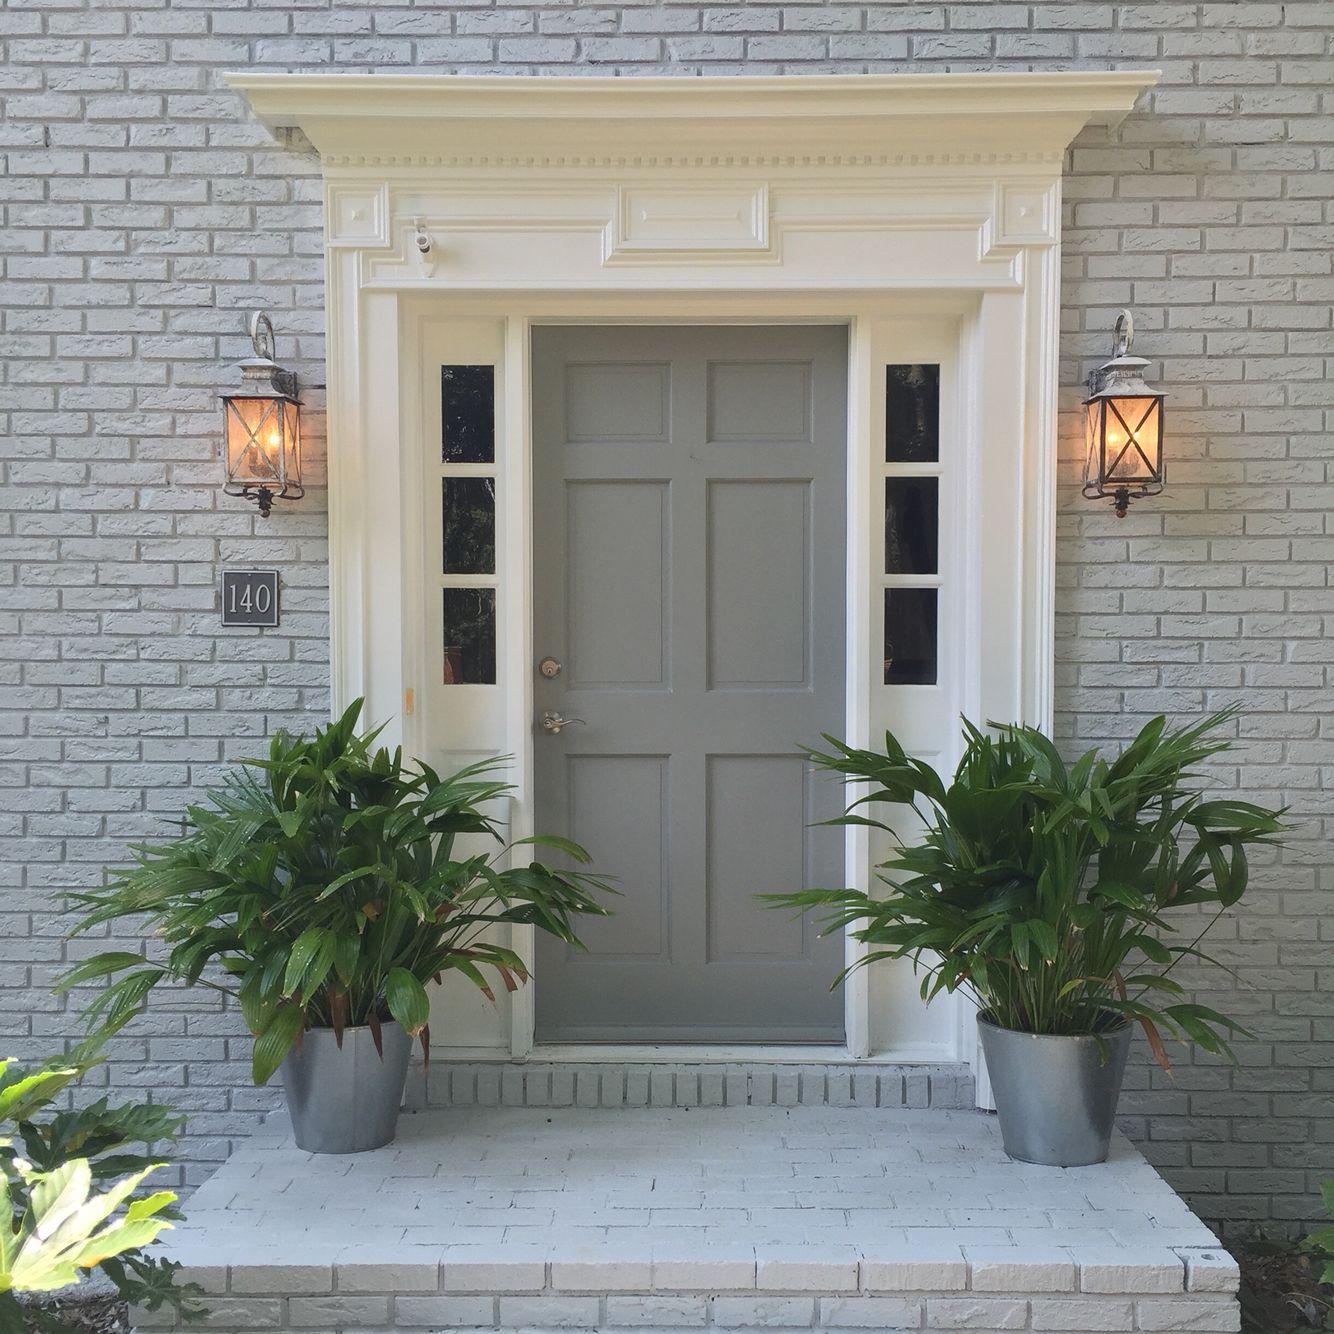 painted brick exterior color schemes. exterior color scheme. download painted brick schemes